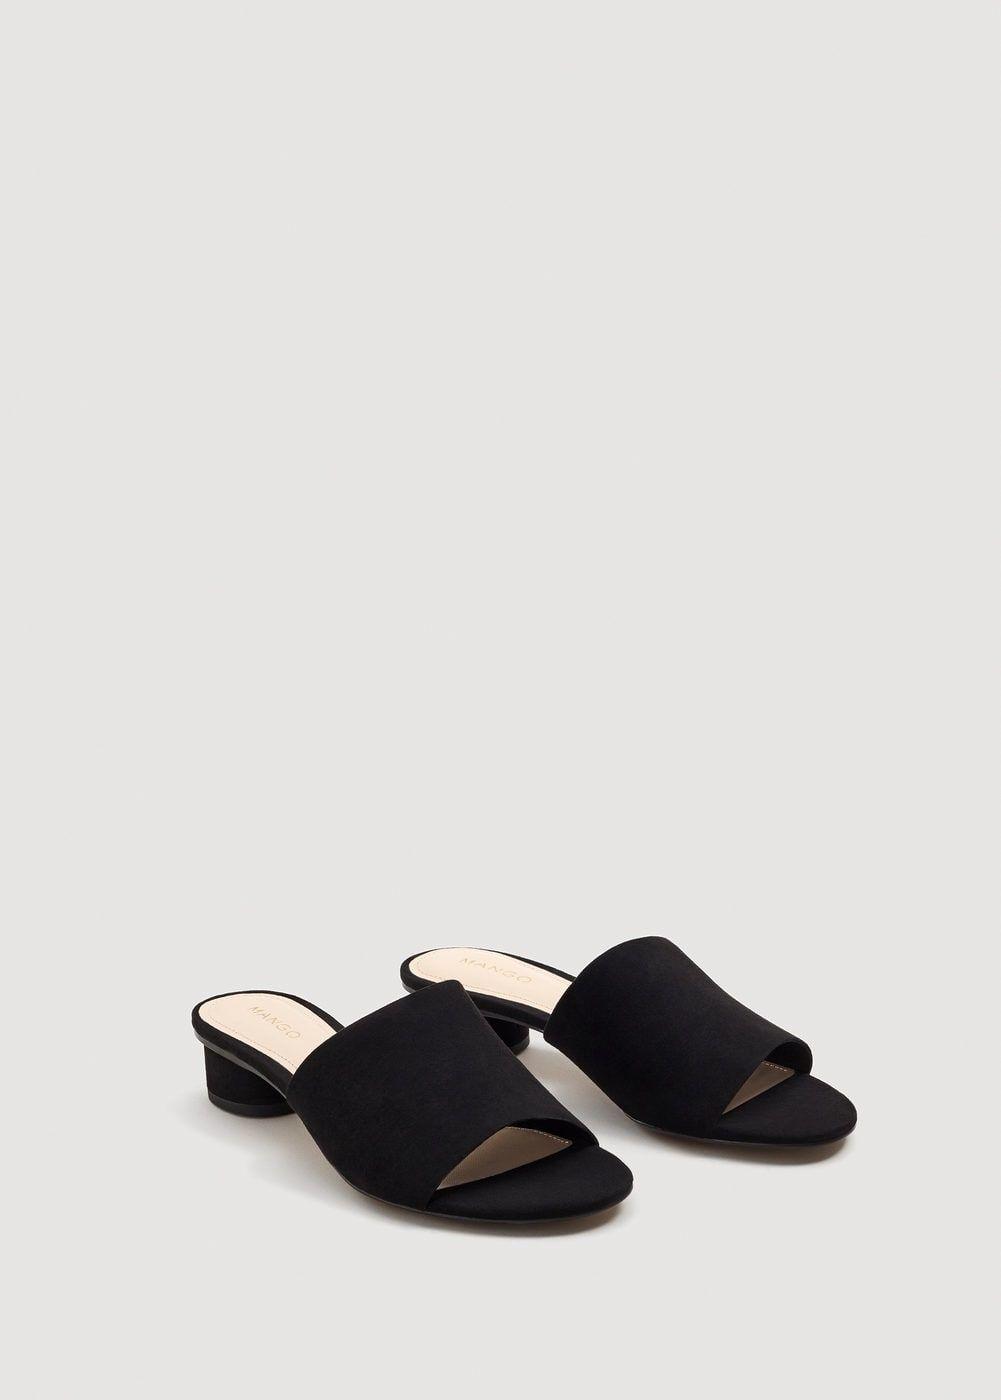 Zapatos WomenShoe Tacon Style Y TaconesSandalias Heel Mules OknP0w